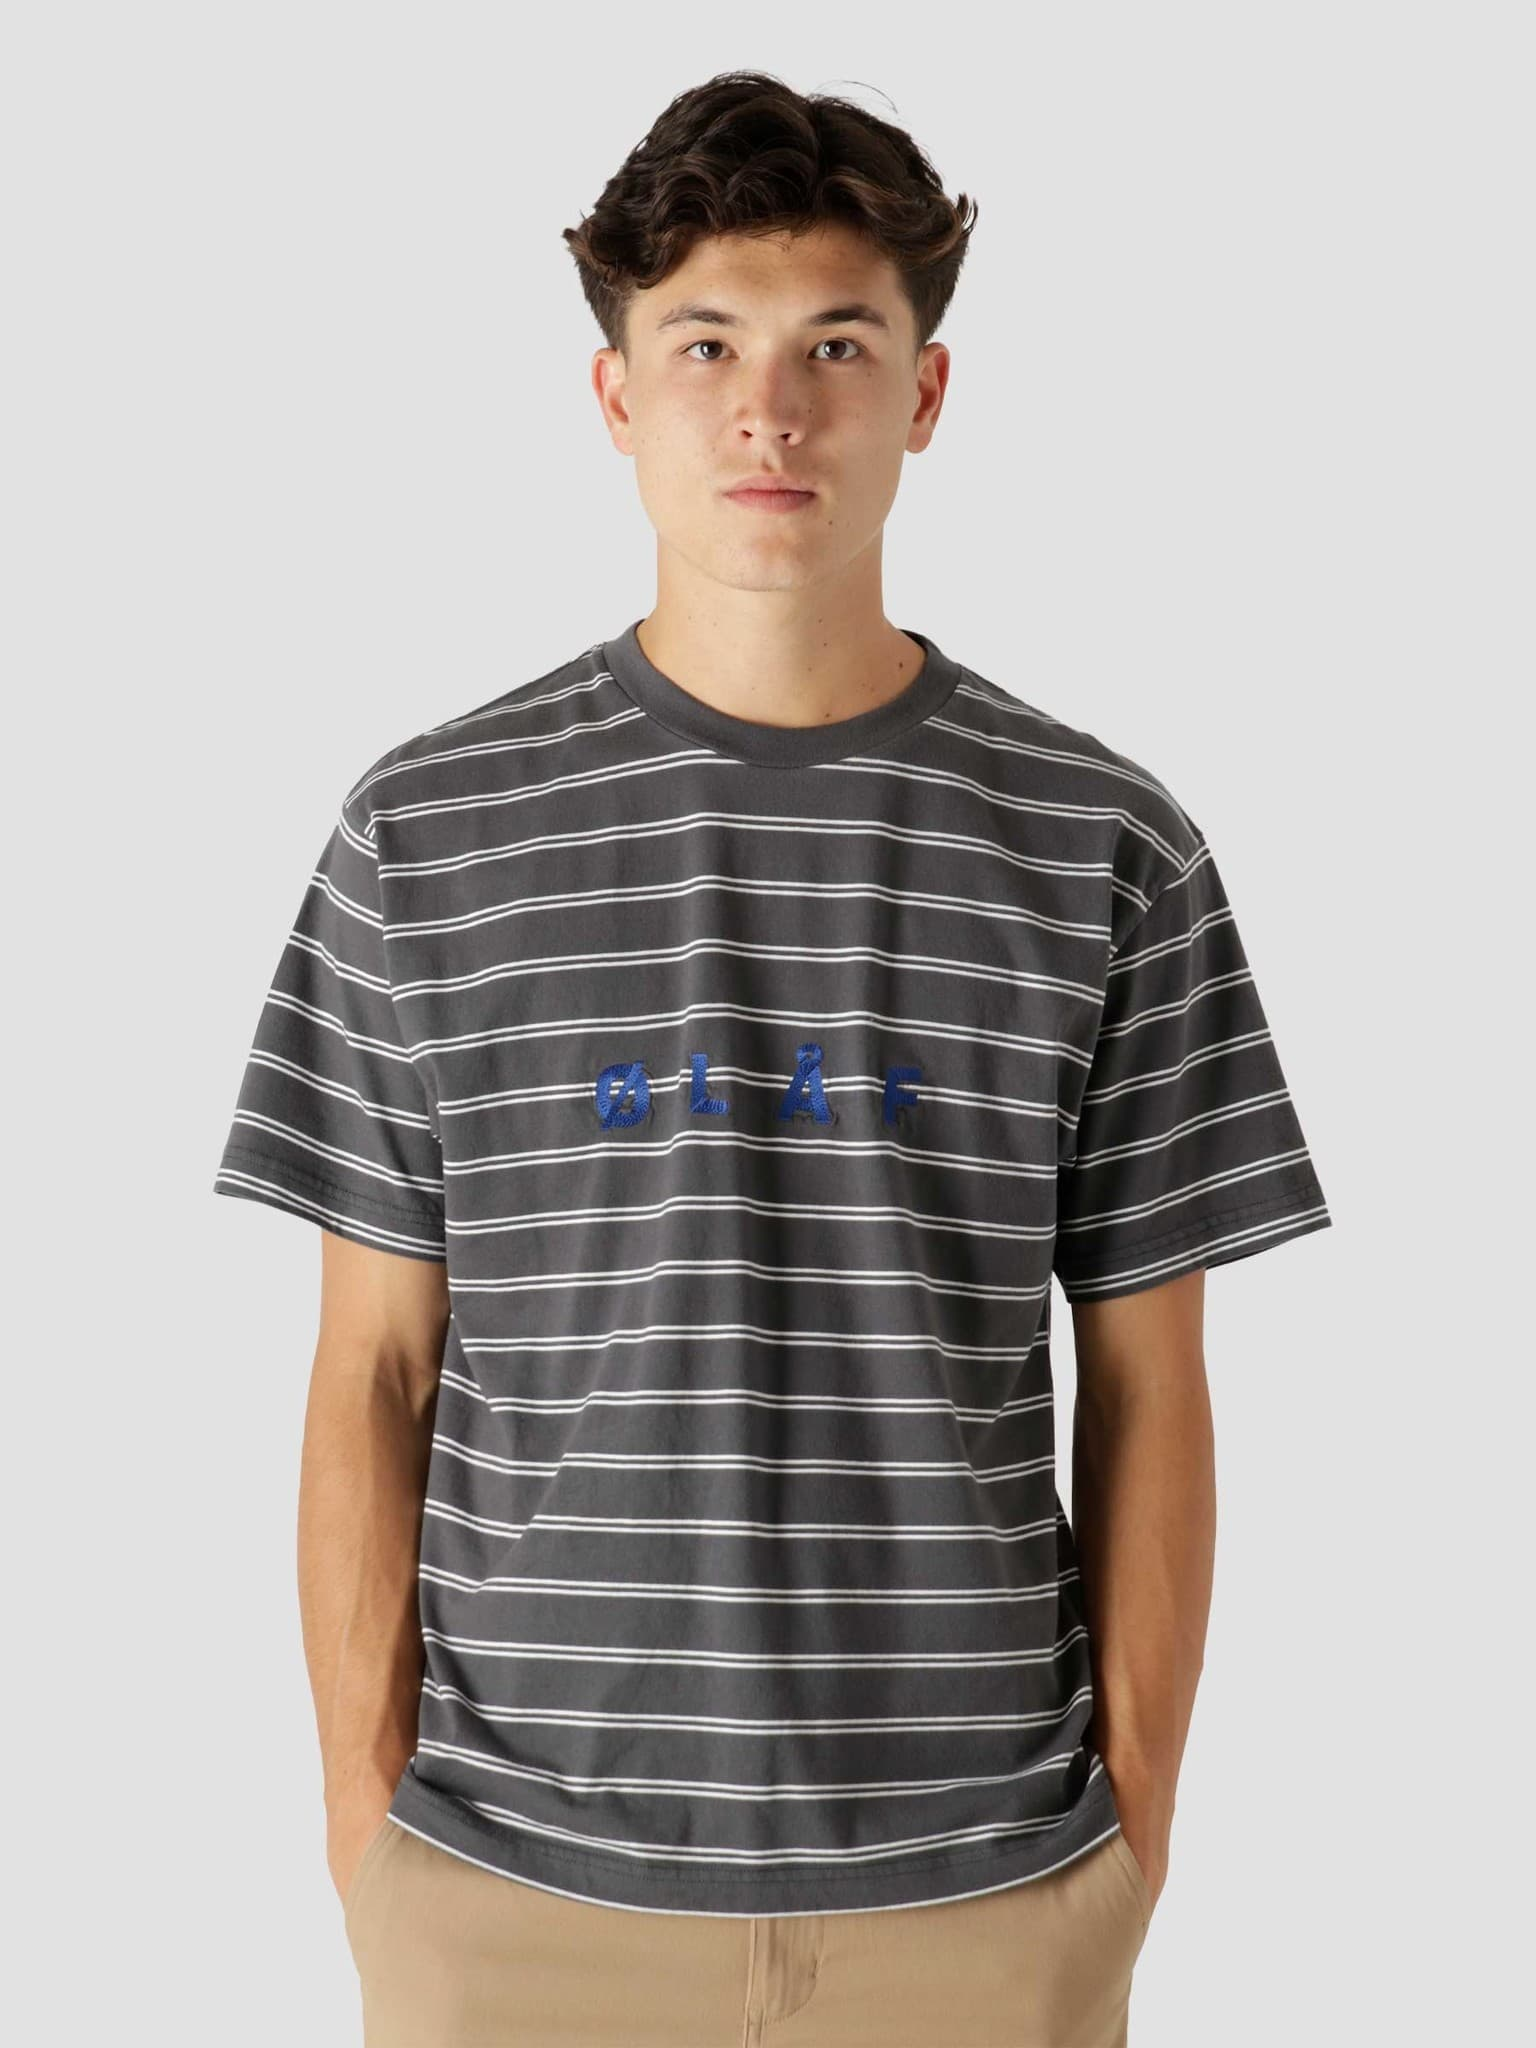 OLAF Mini Stripe T-Shirt Dark Grey White